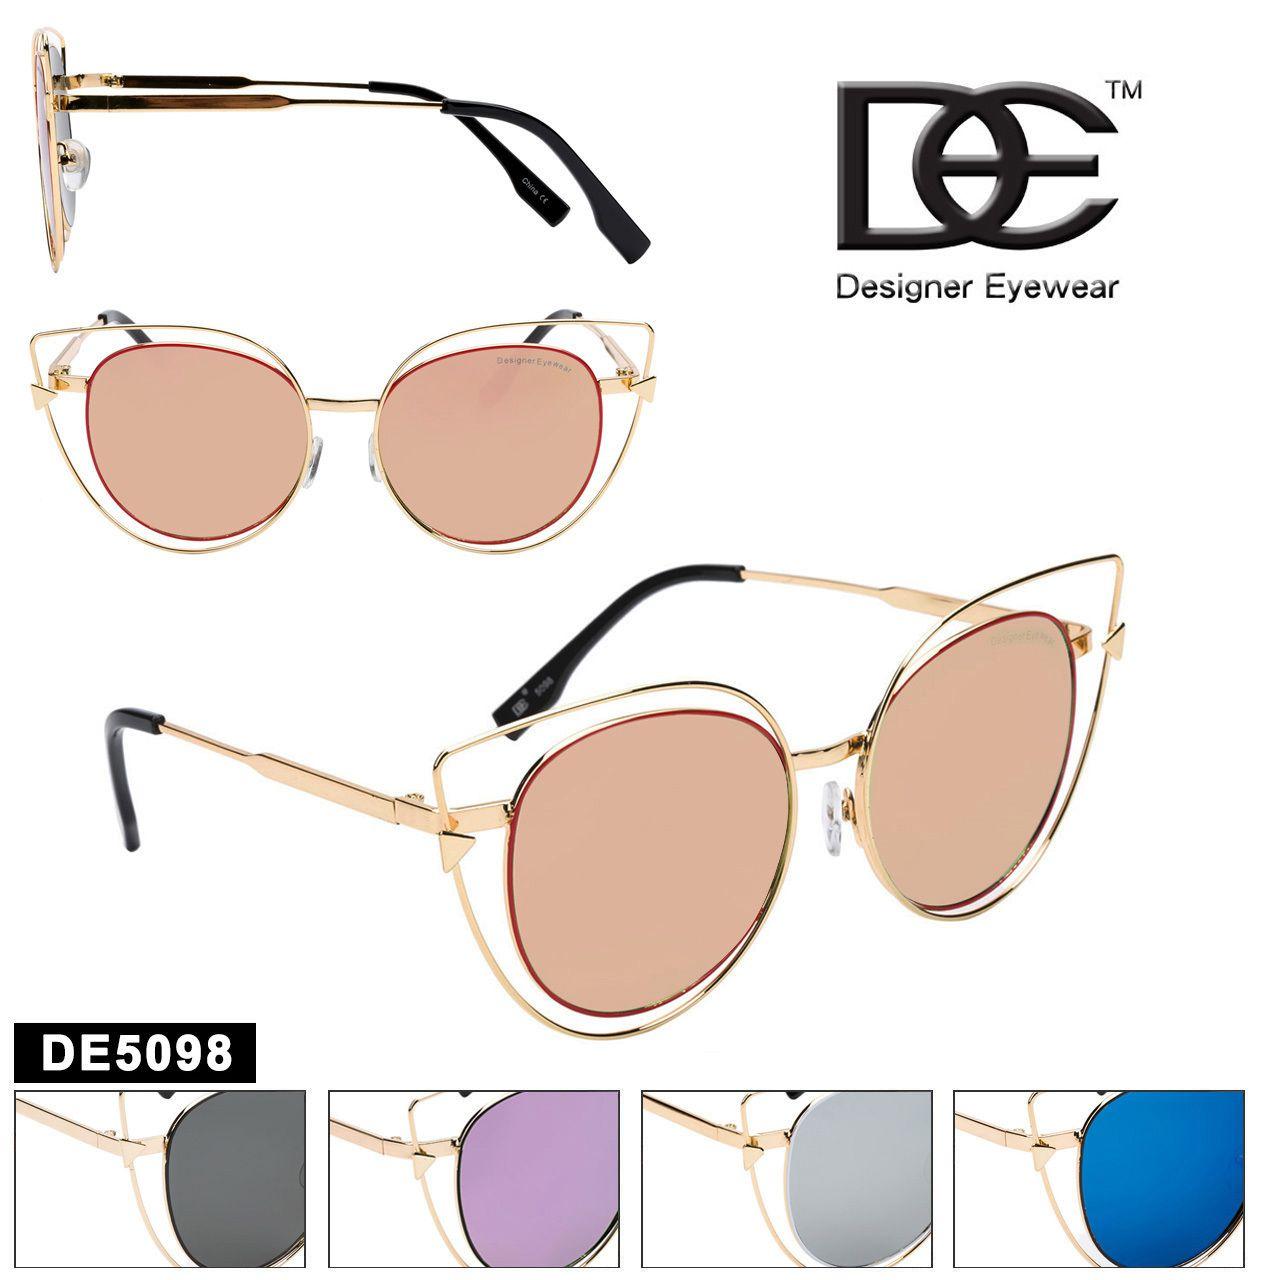 e91c9a8e6 Cat Eye Sunglasses by DE™ Designer Eyewear - Style #DE5098 | CTS Wholesale  Sunglasses